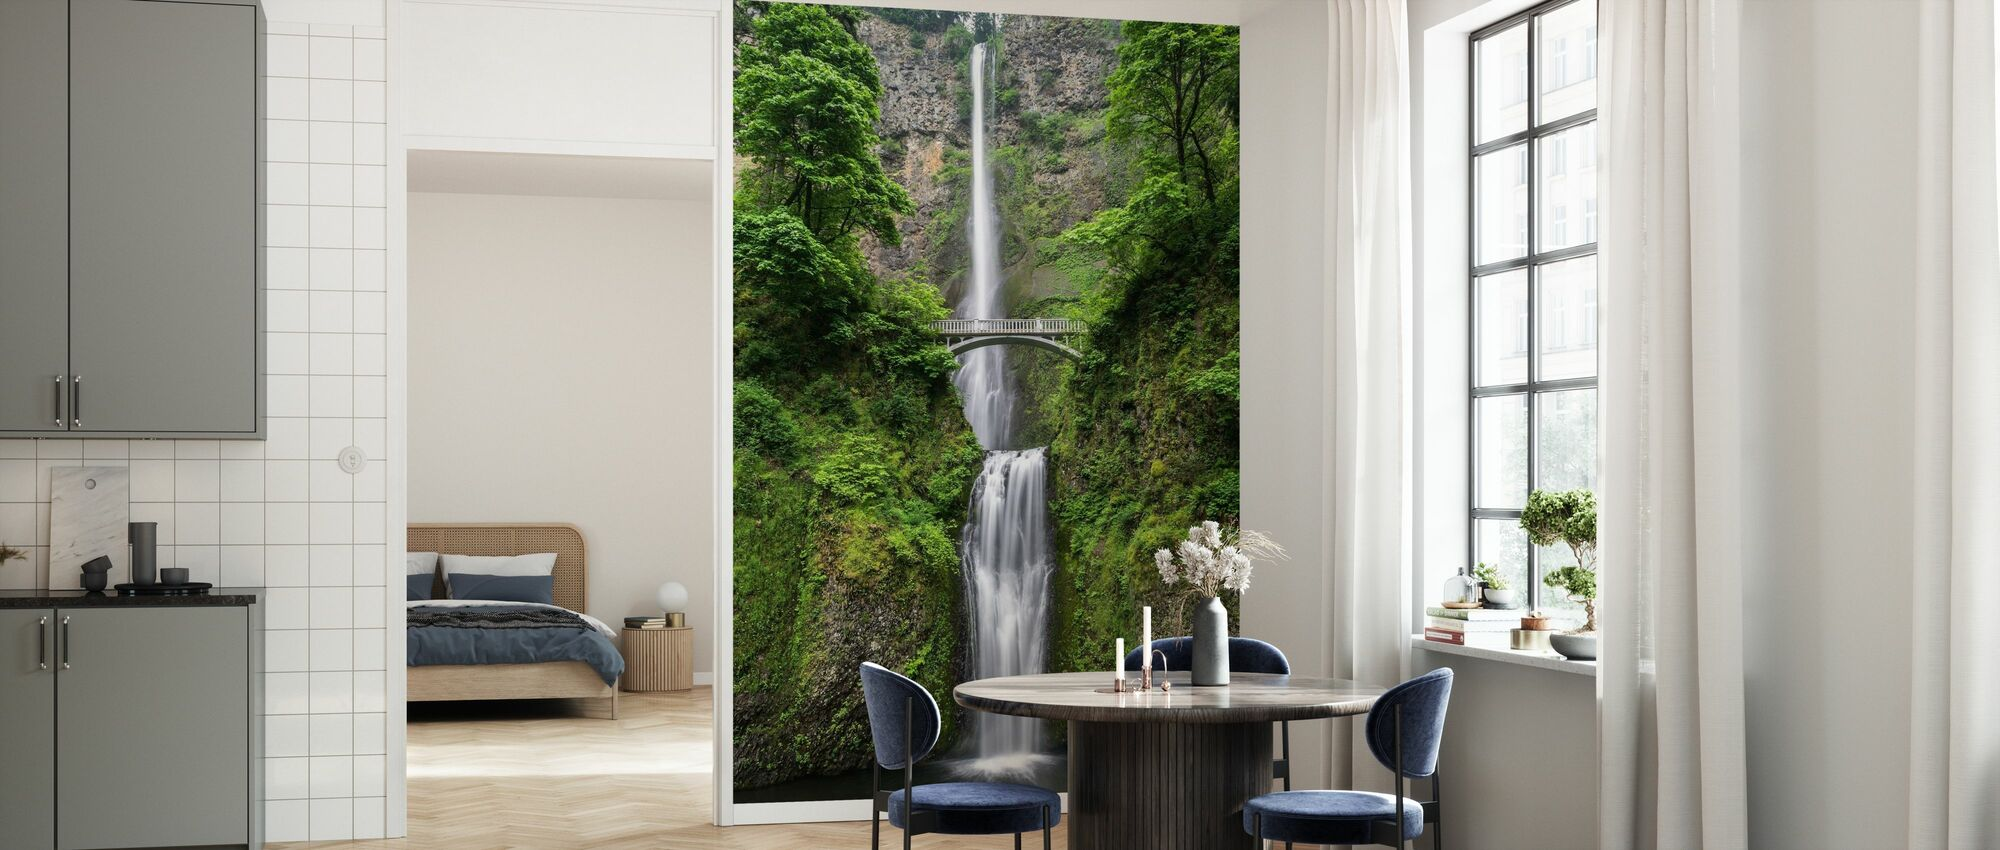 Waterwall and Bridge - Wallpaper - Kitchen